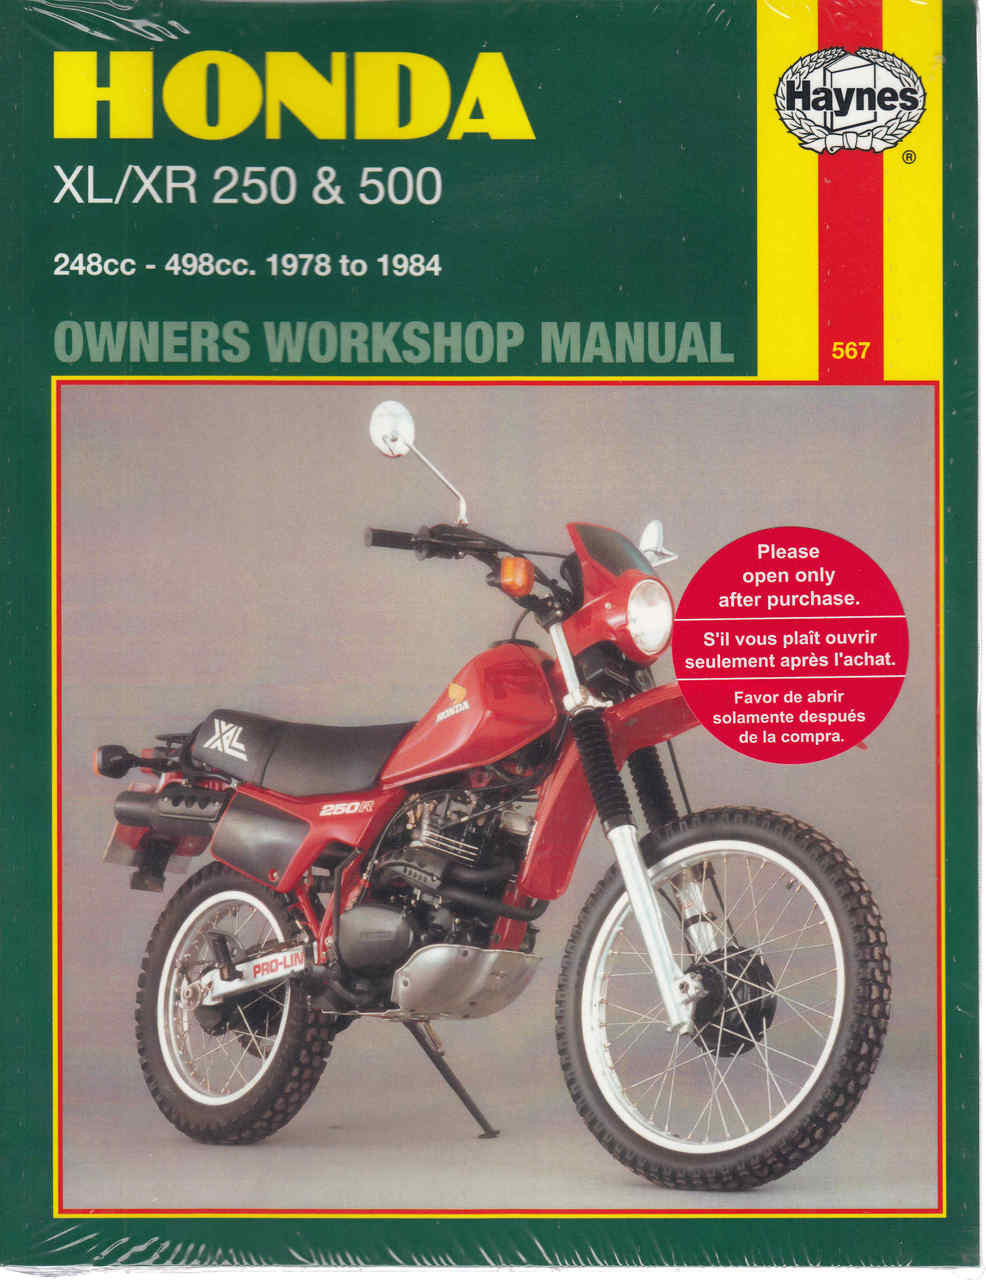 1986 Honda Xl 250r Shop Manual Motorcycle Service Manualsonline